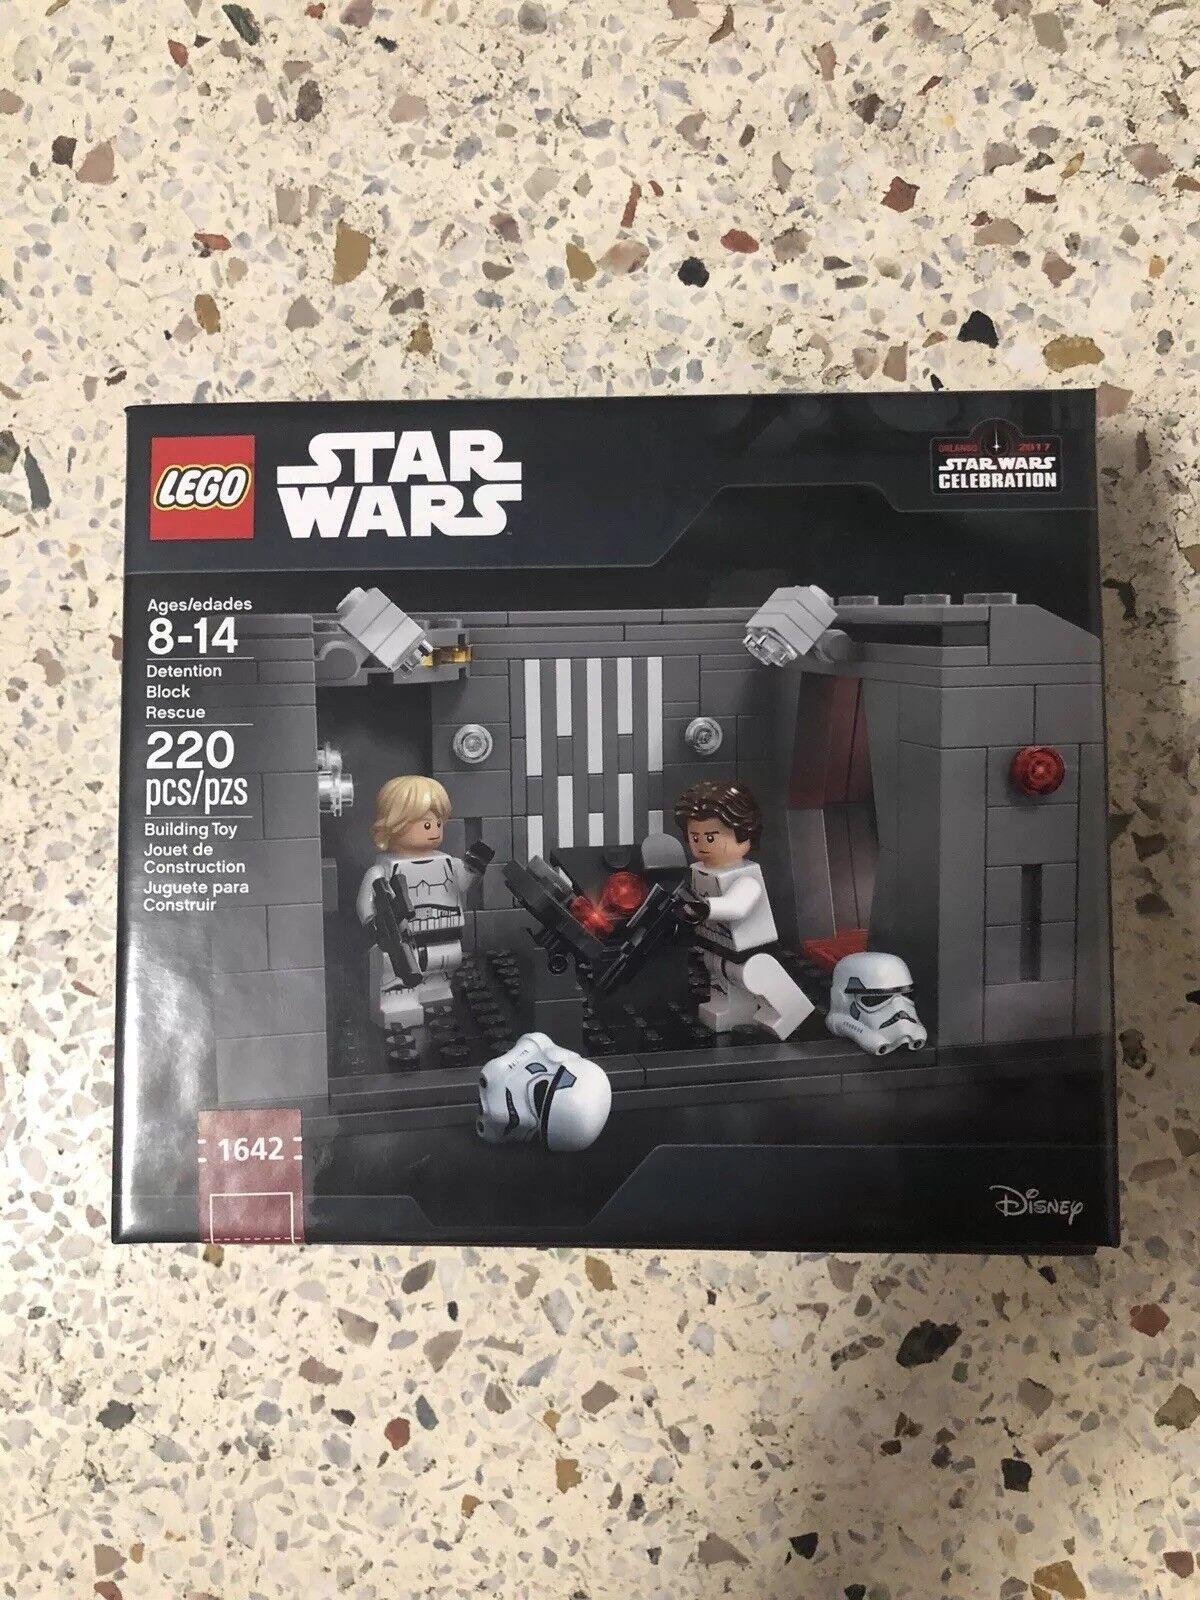 2017 Lego Stern Wars Celebration Detention Block Rescue Set   1642